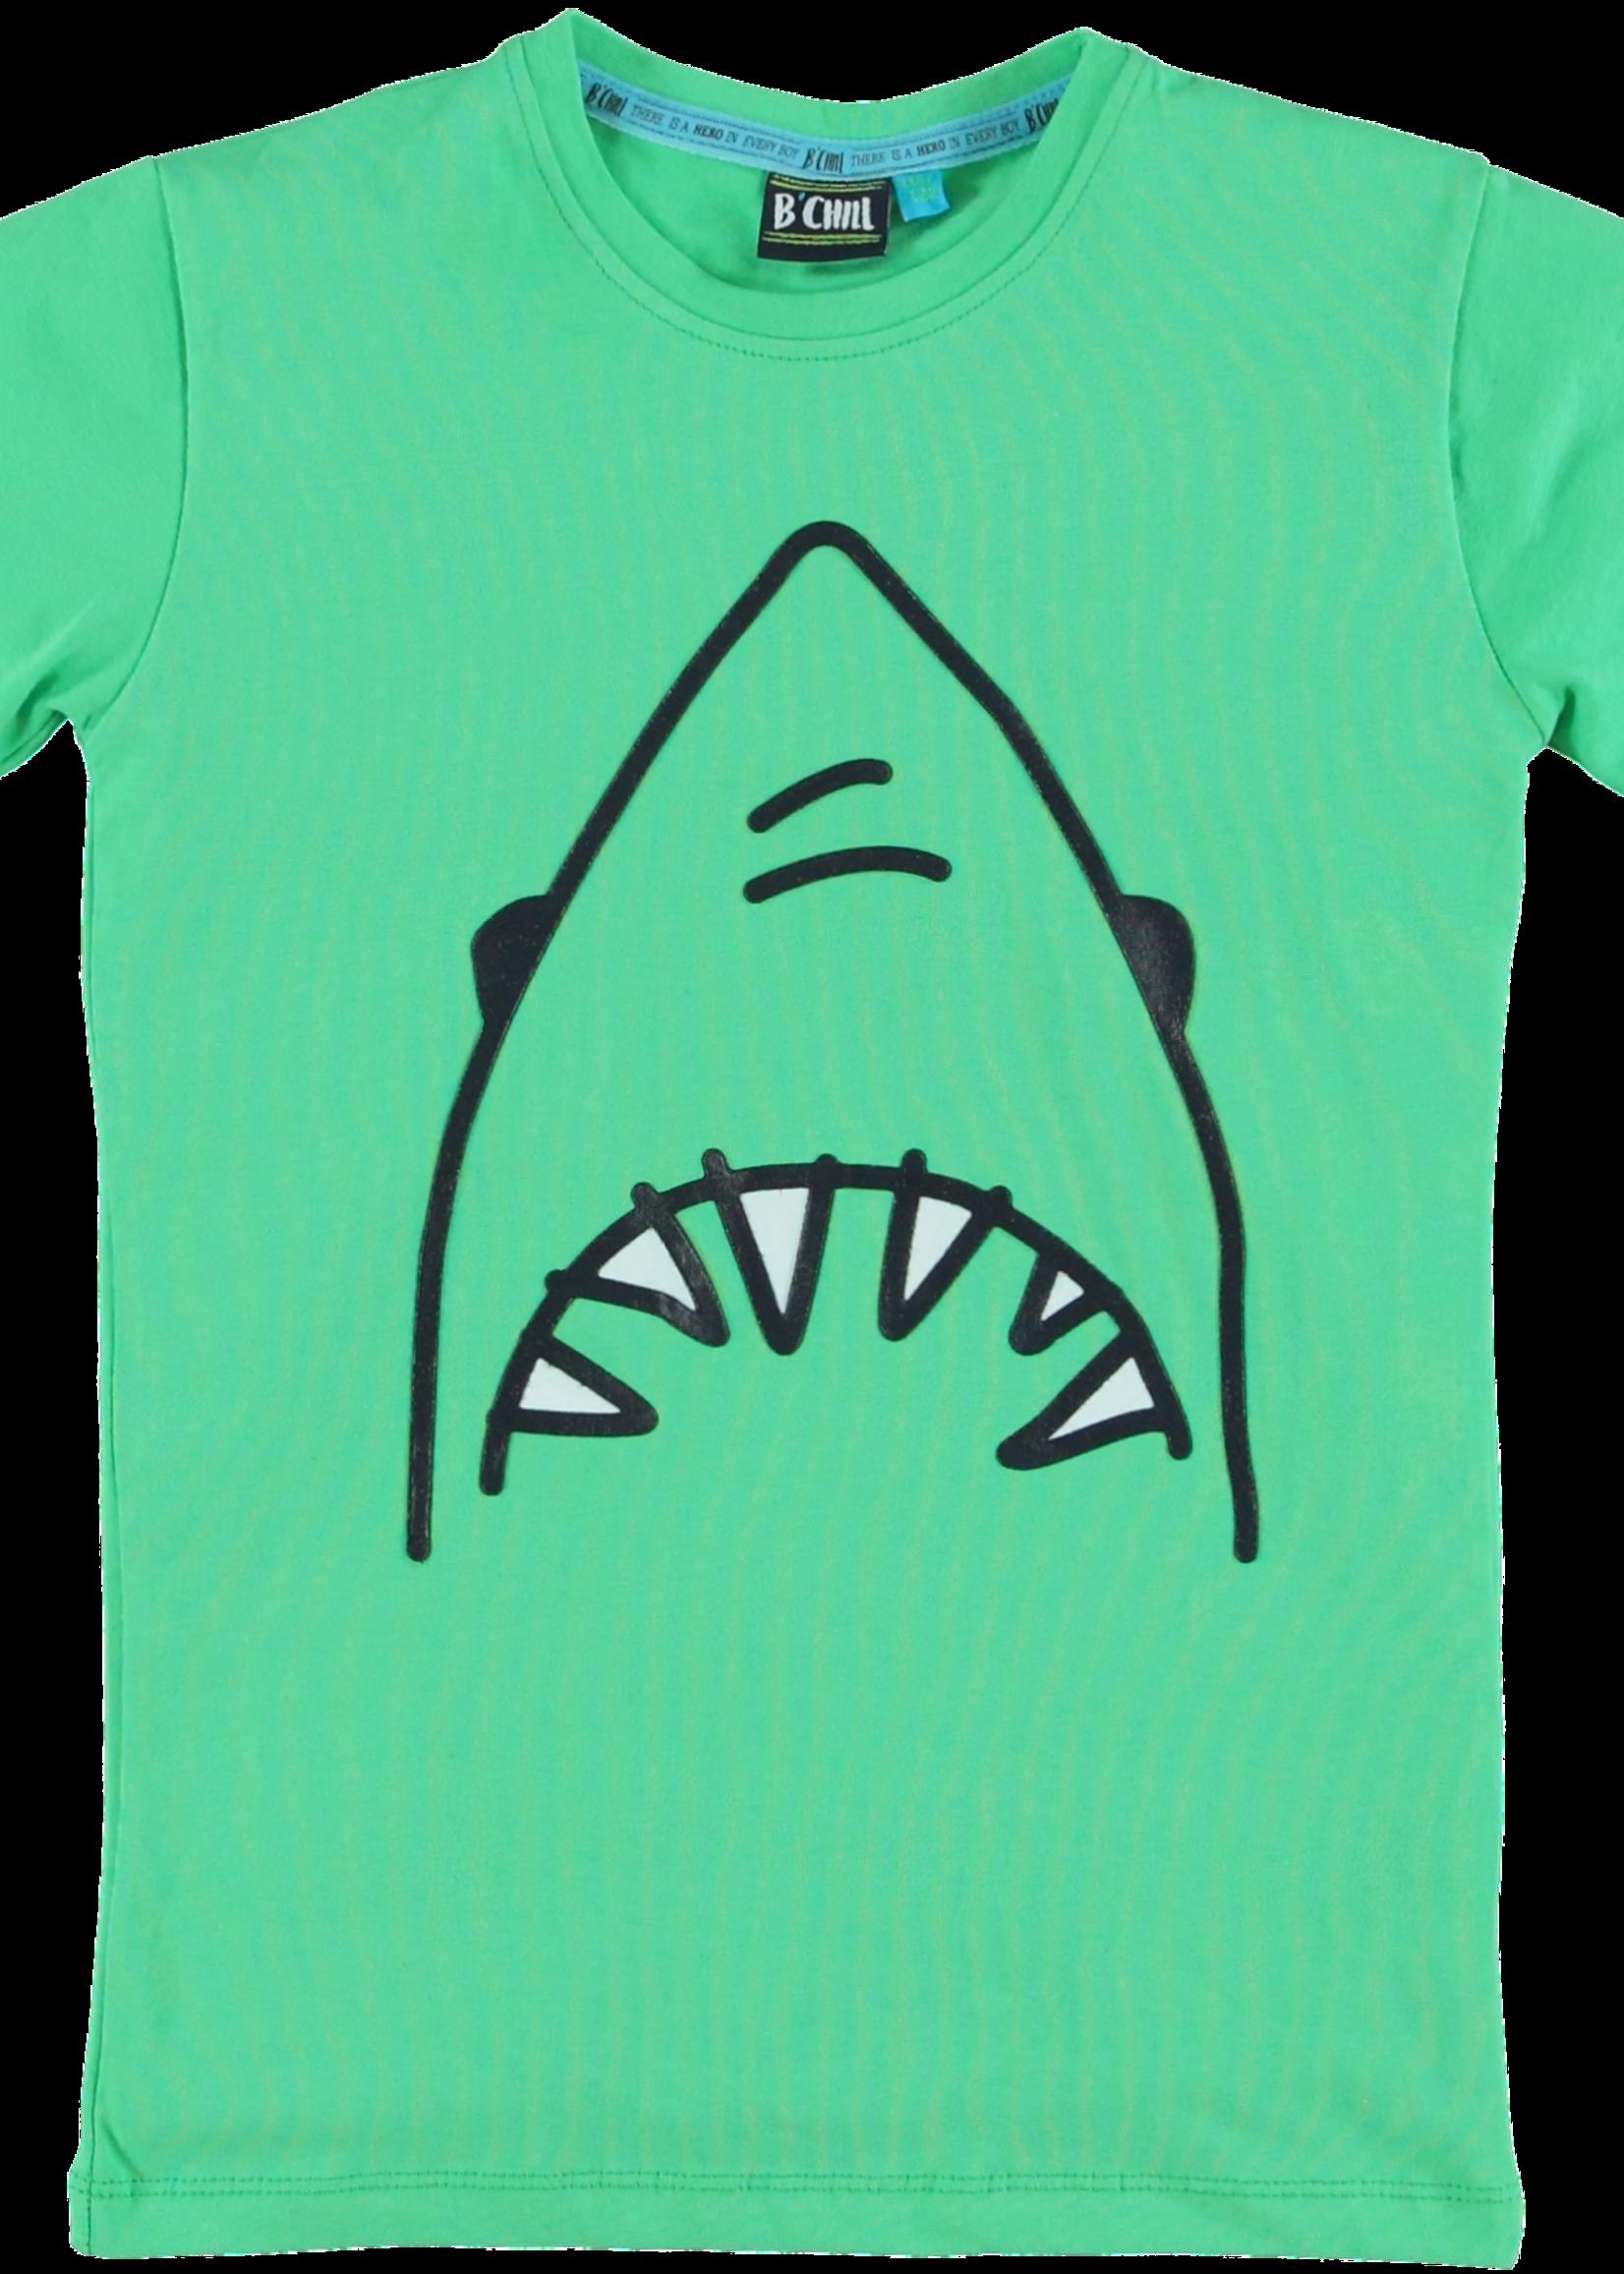 B'chill Ritchie t-shirt